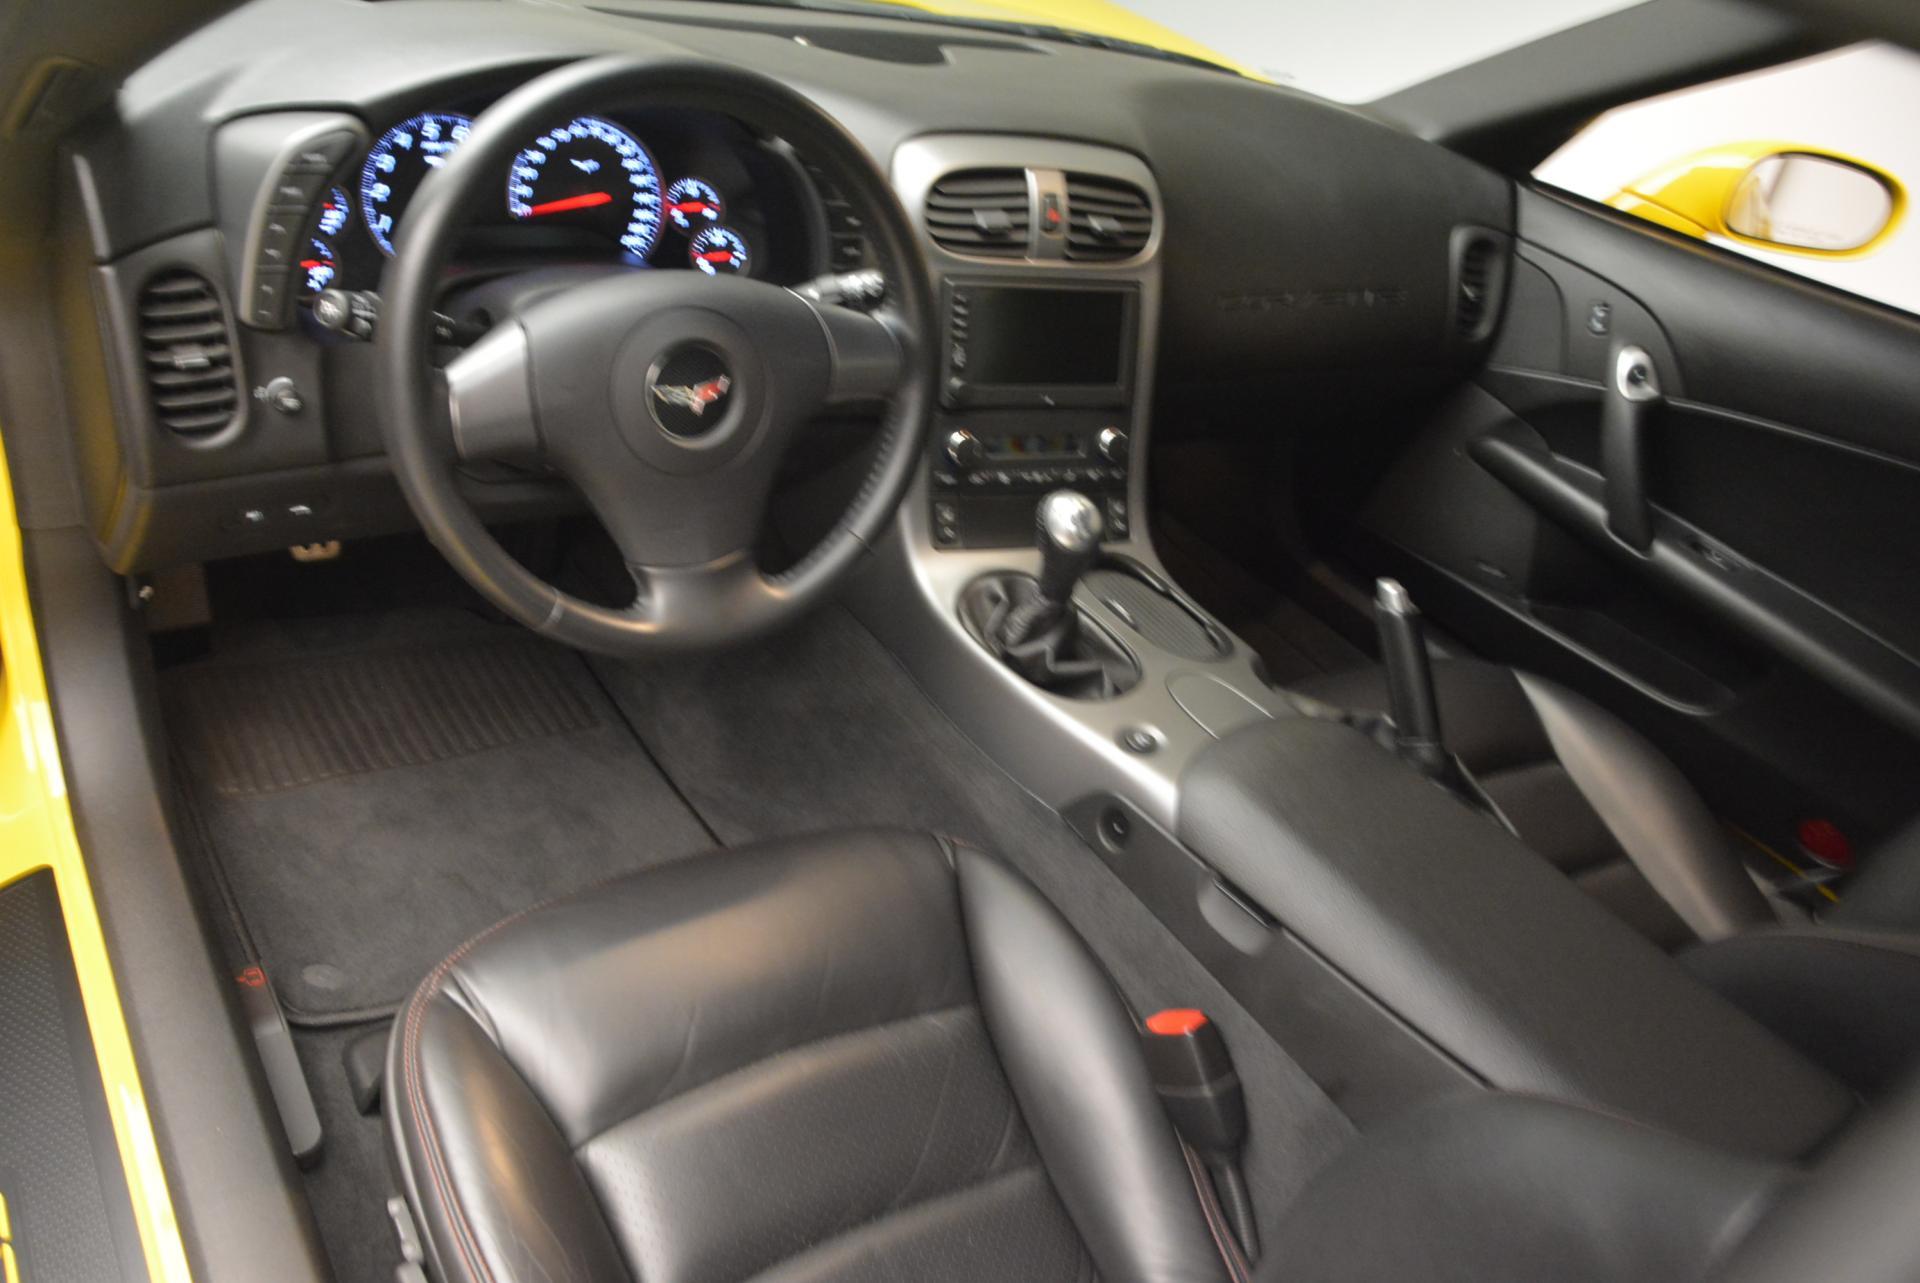 Used 2006 Chevrolet Corvette Z06 Hardtop | Greenwich, CT